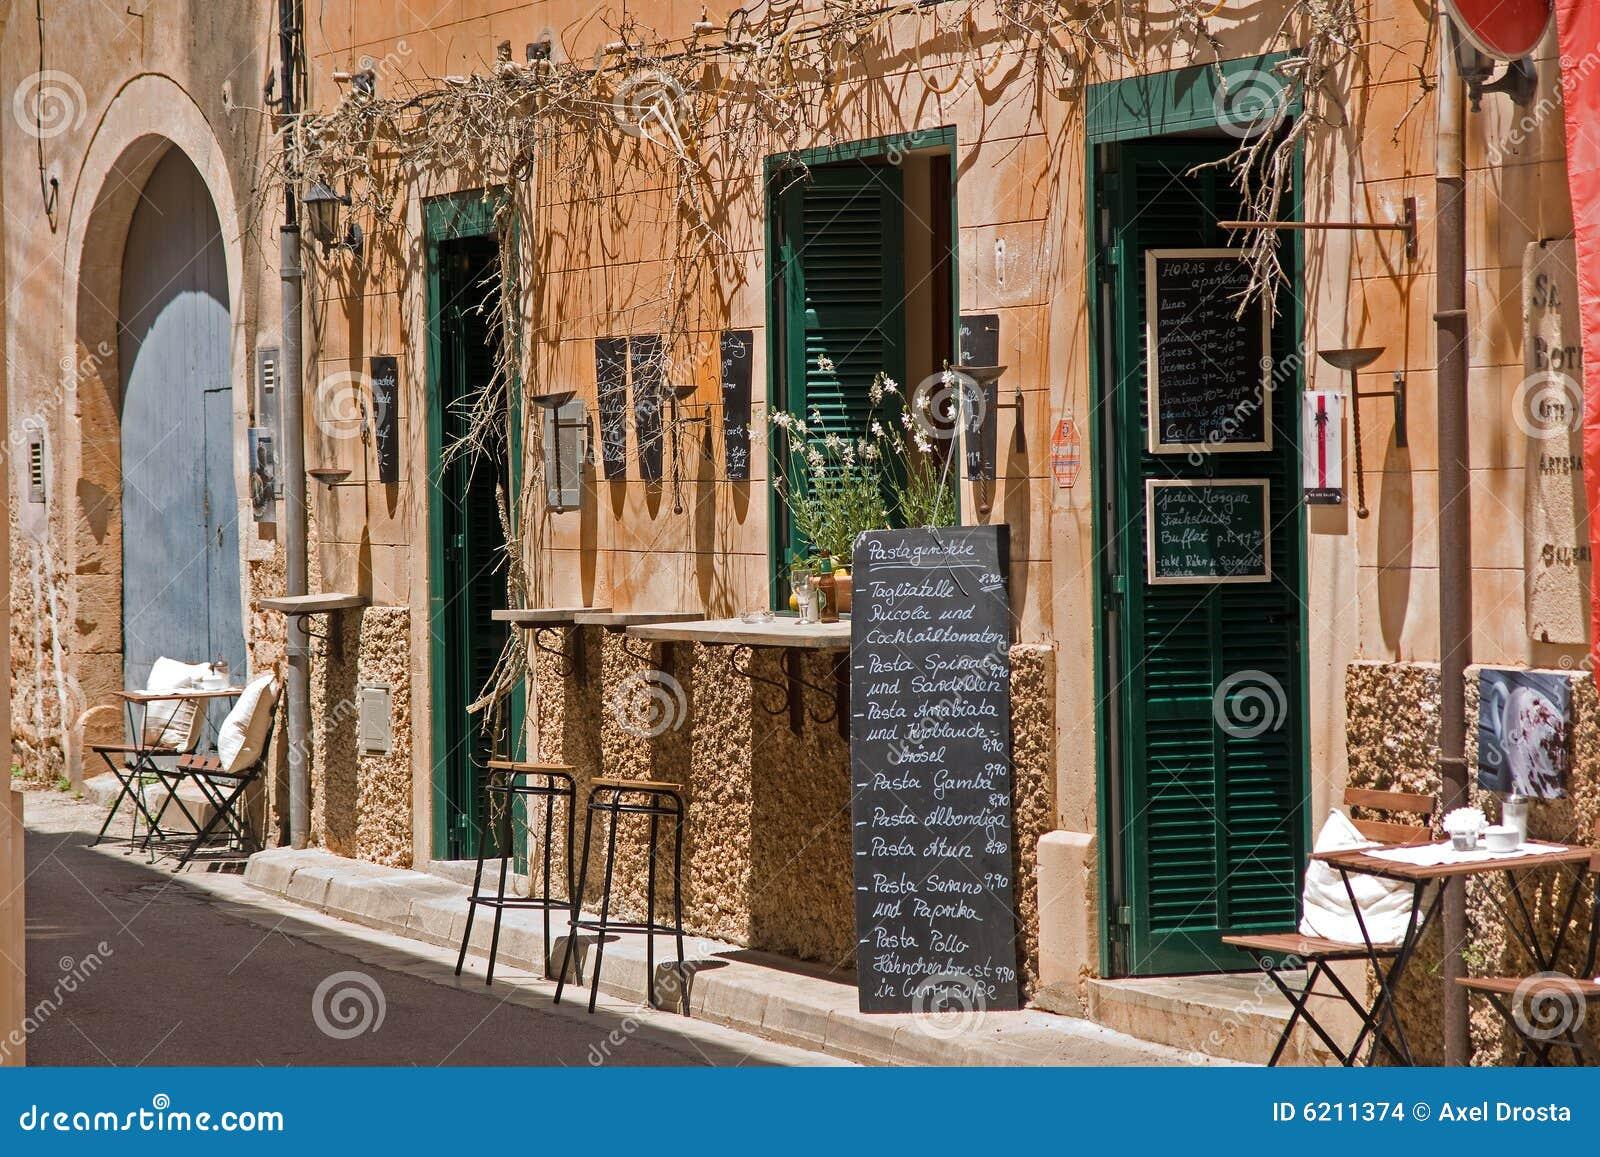 Exterior Of Spanish Restaurant Stock Photo Image Of Hospitality Building 6211374